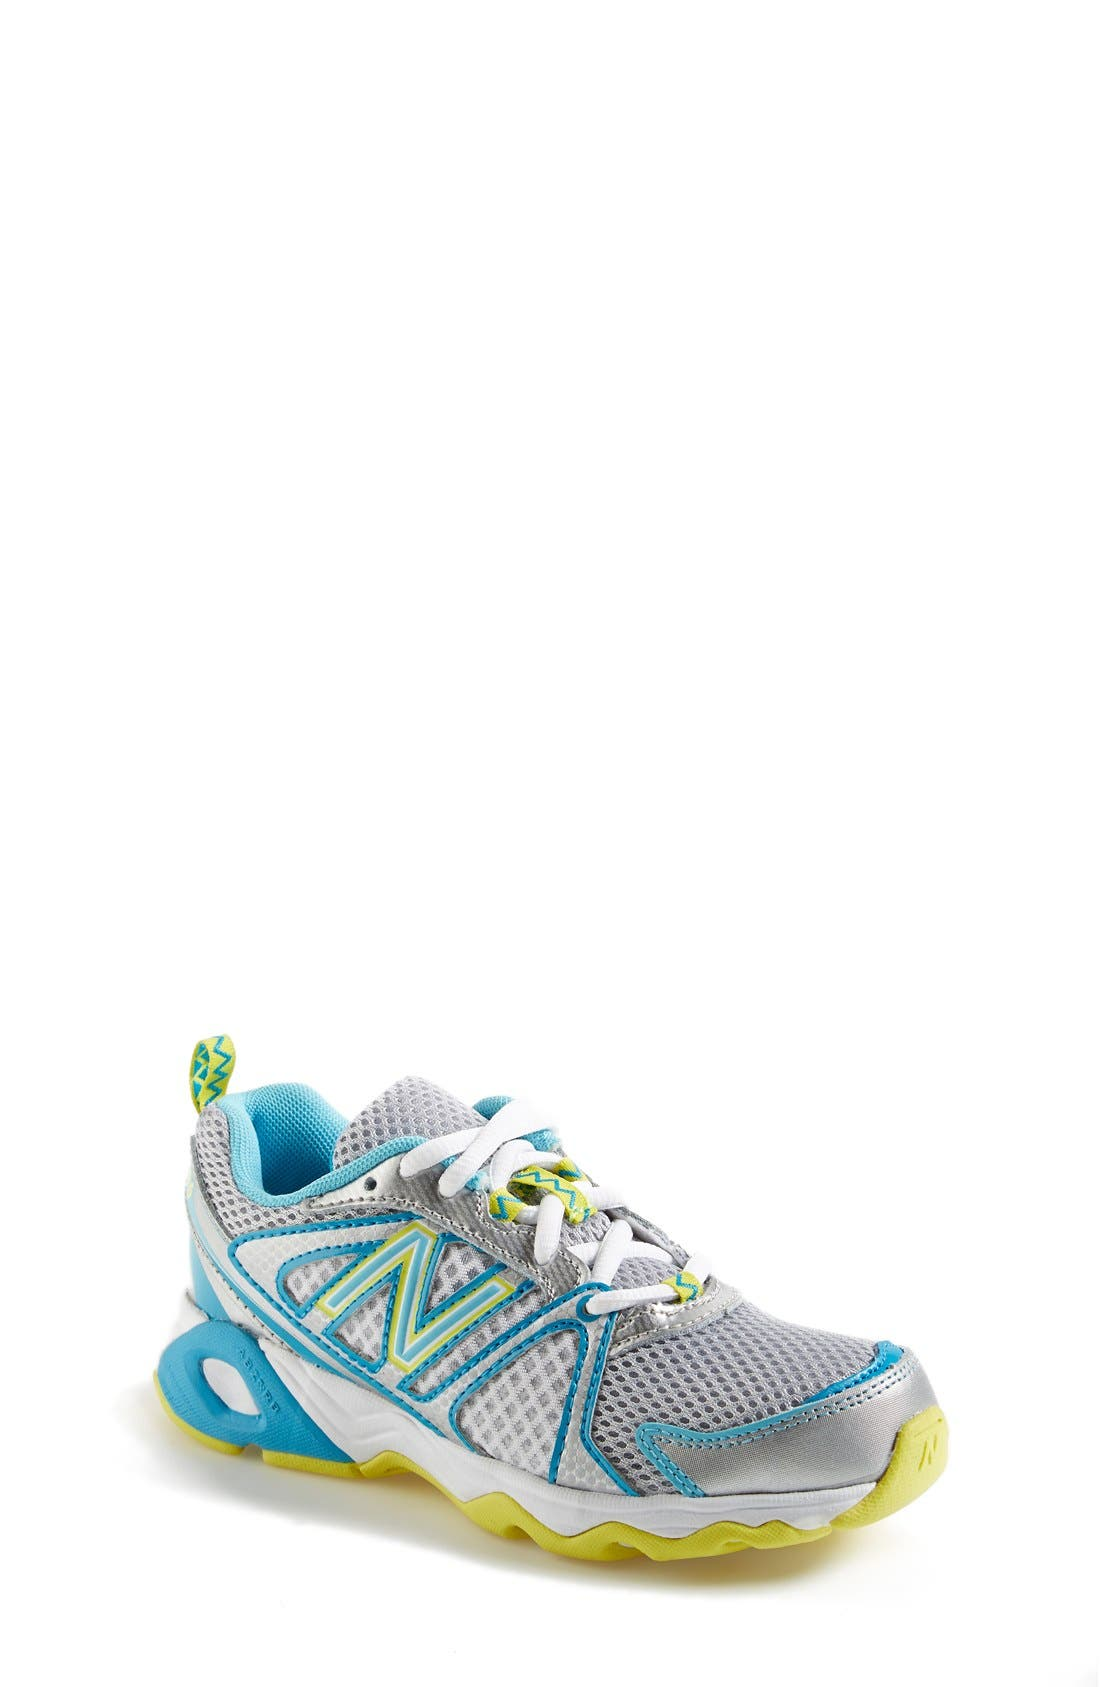 Main Image - New Balance '696' Athletic Shoe (Toddler, Little Kid & Big Kid)